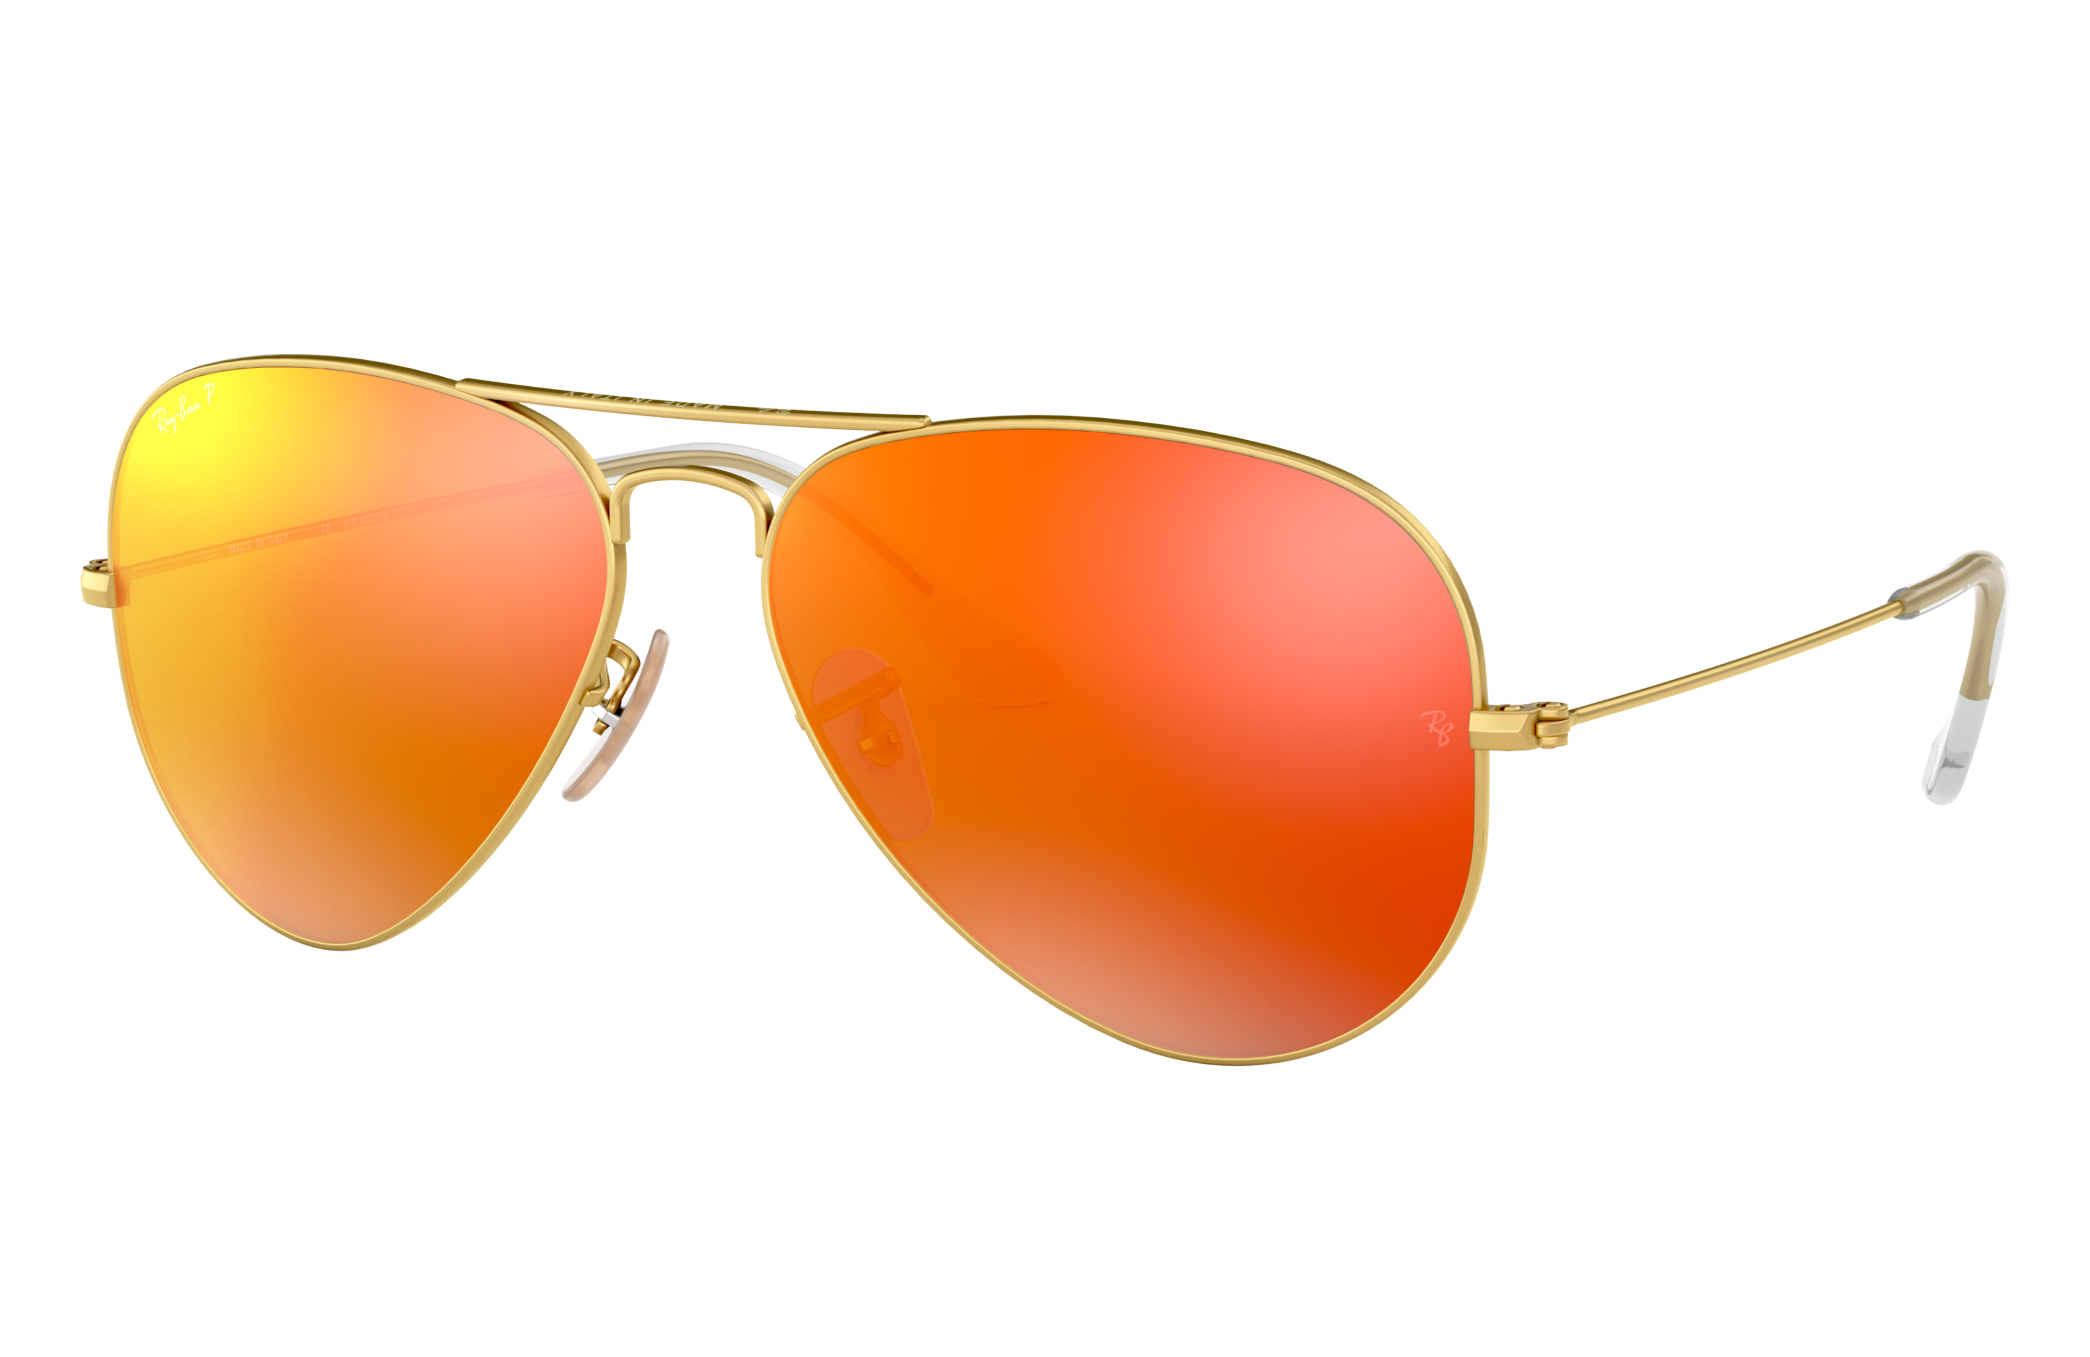 Ray-Ban Aviator Flash Lenses Gold, Polarized Orange Lenses - RB3025